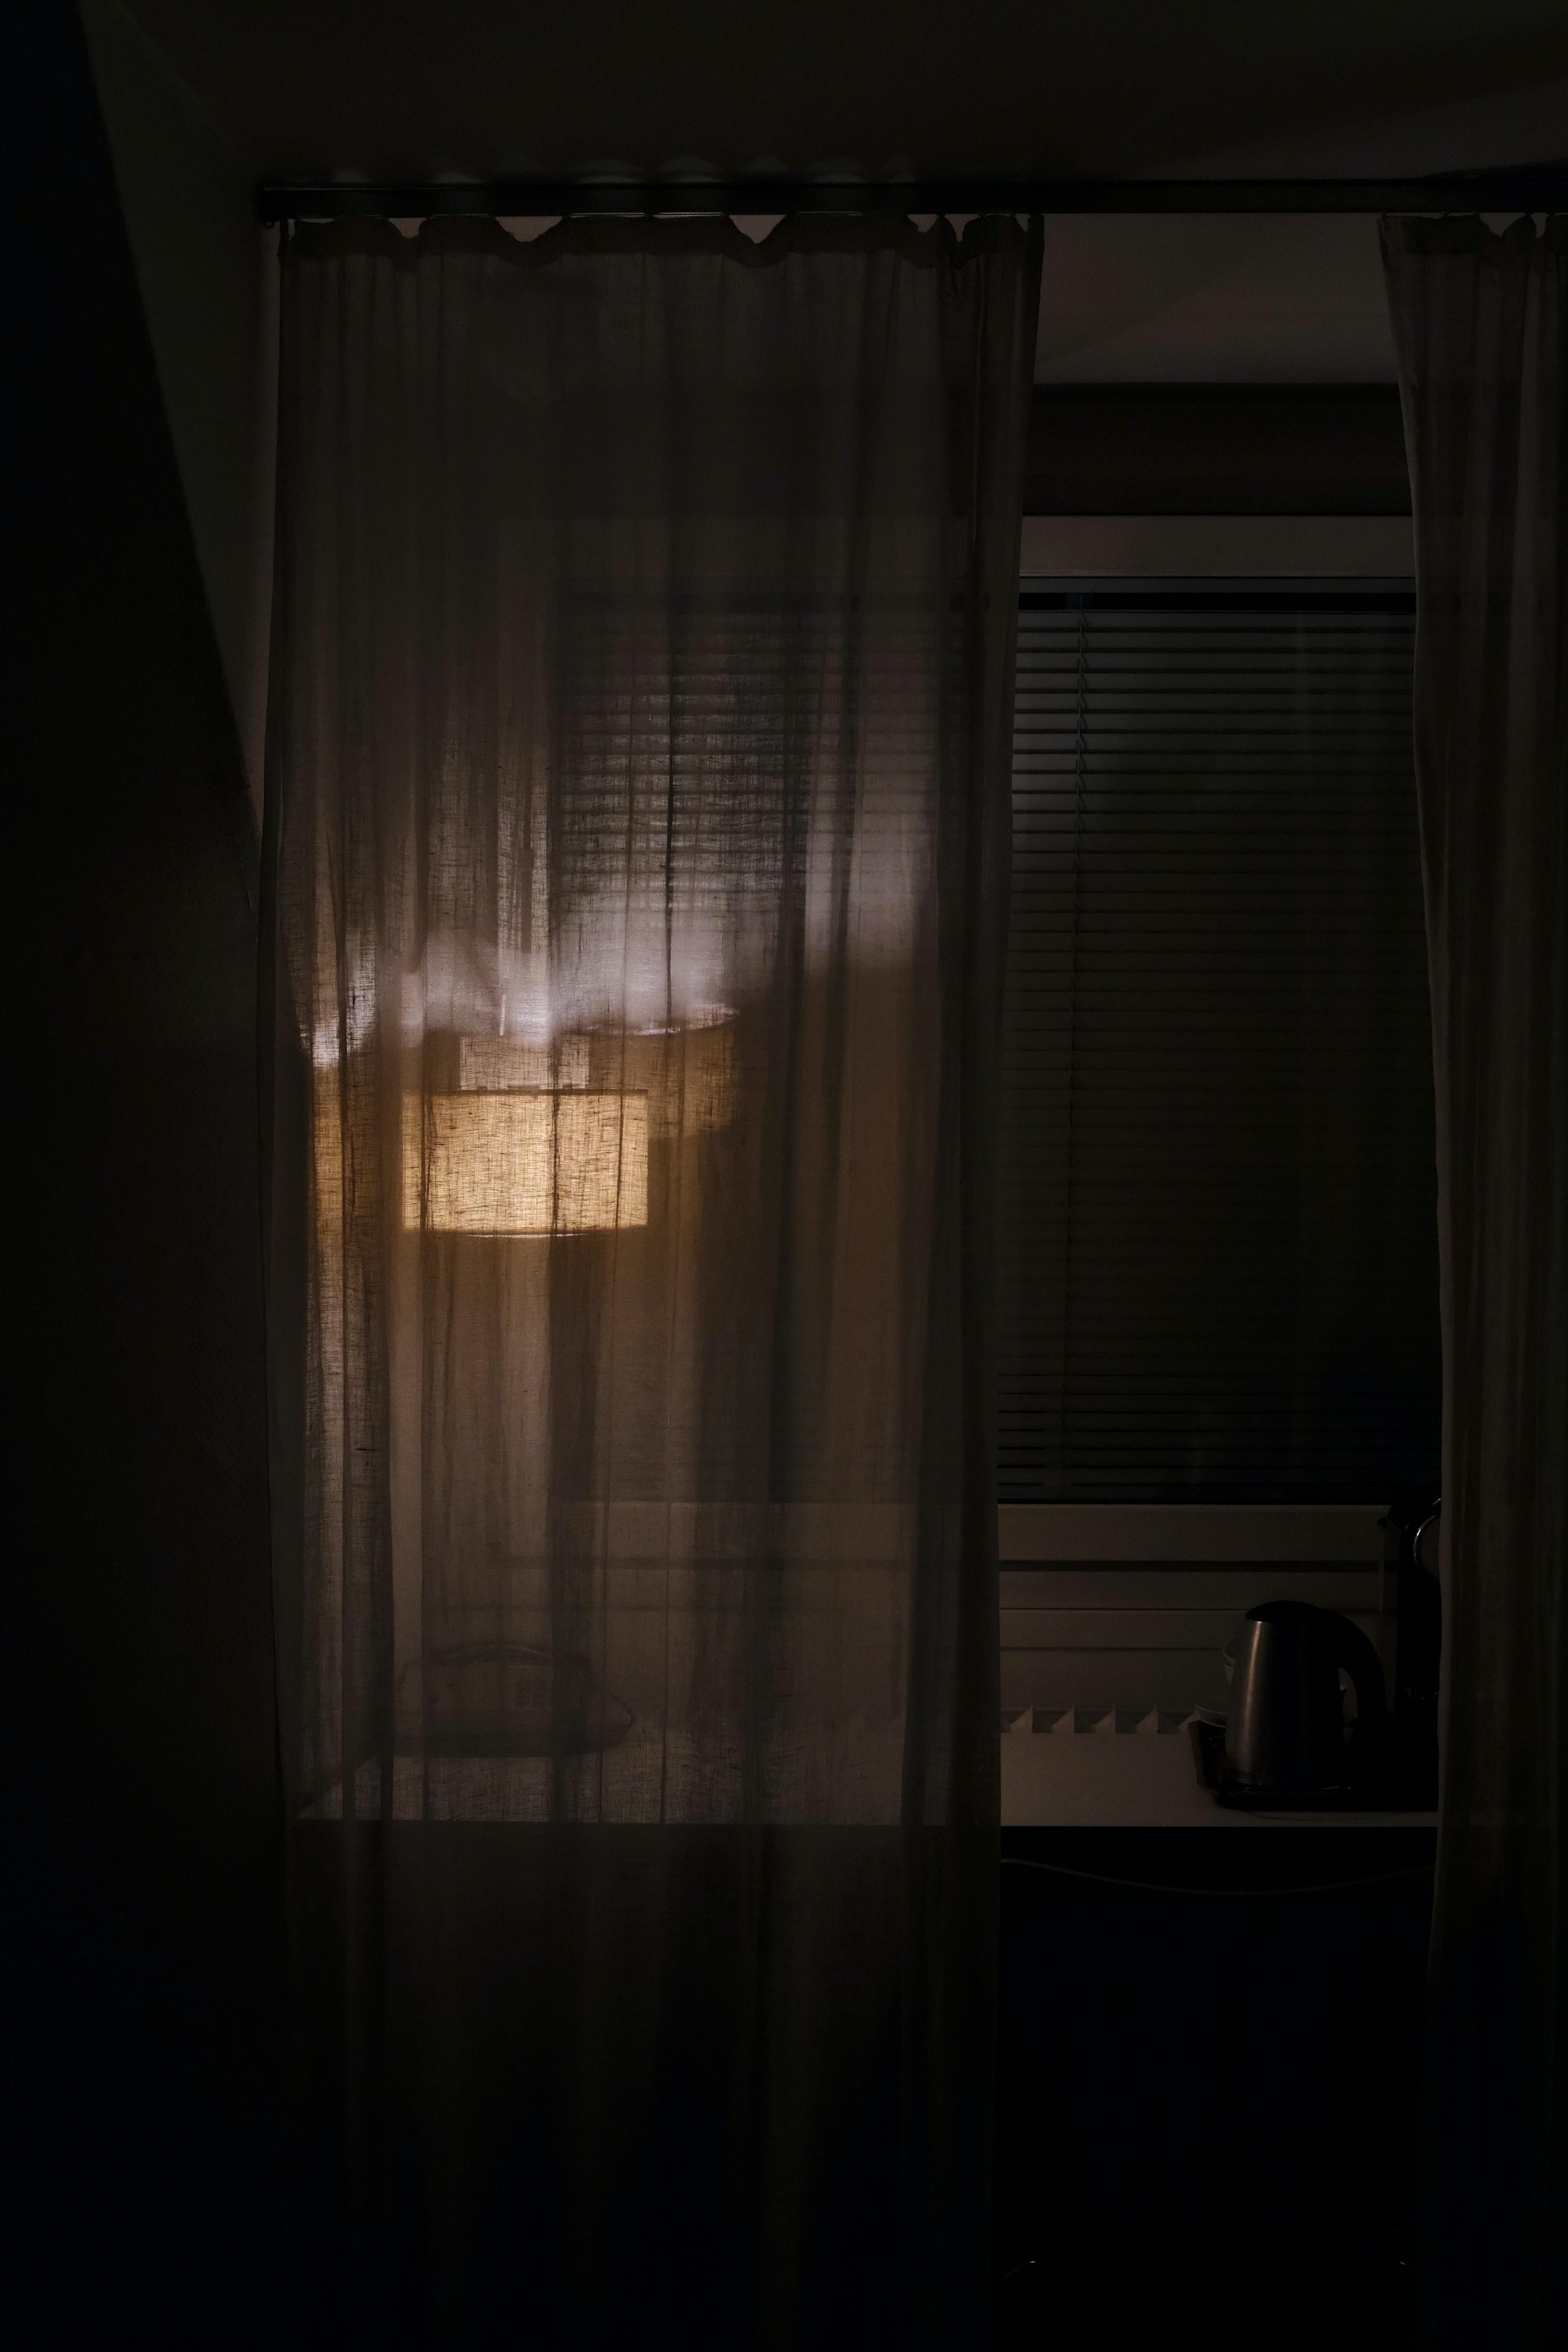 Dark Window Pictures Download Free Images On Unsplash